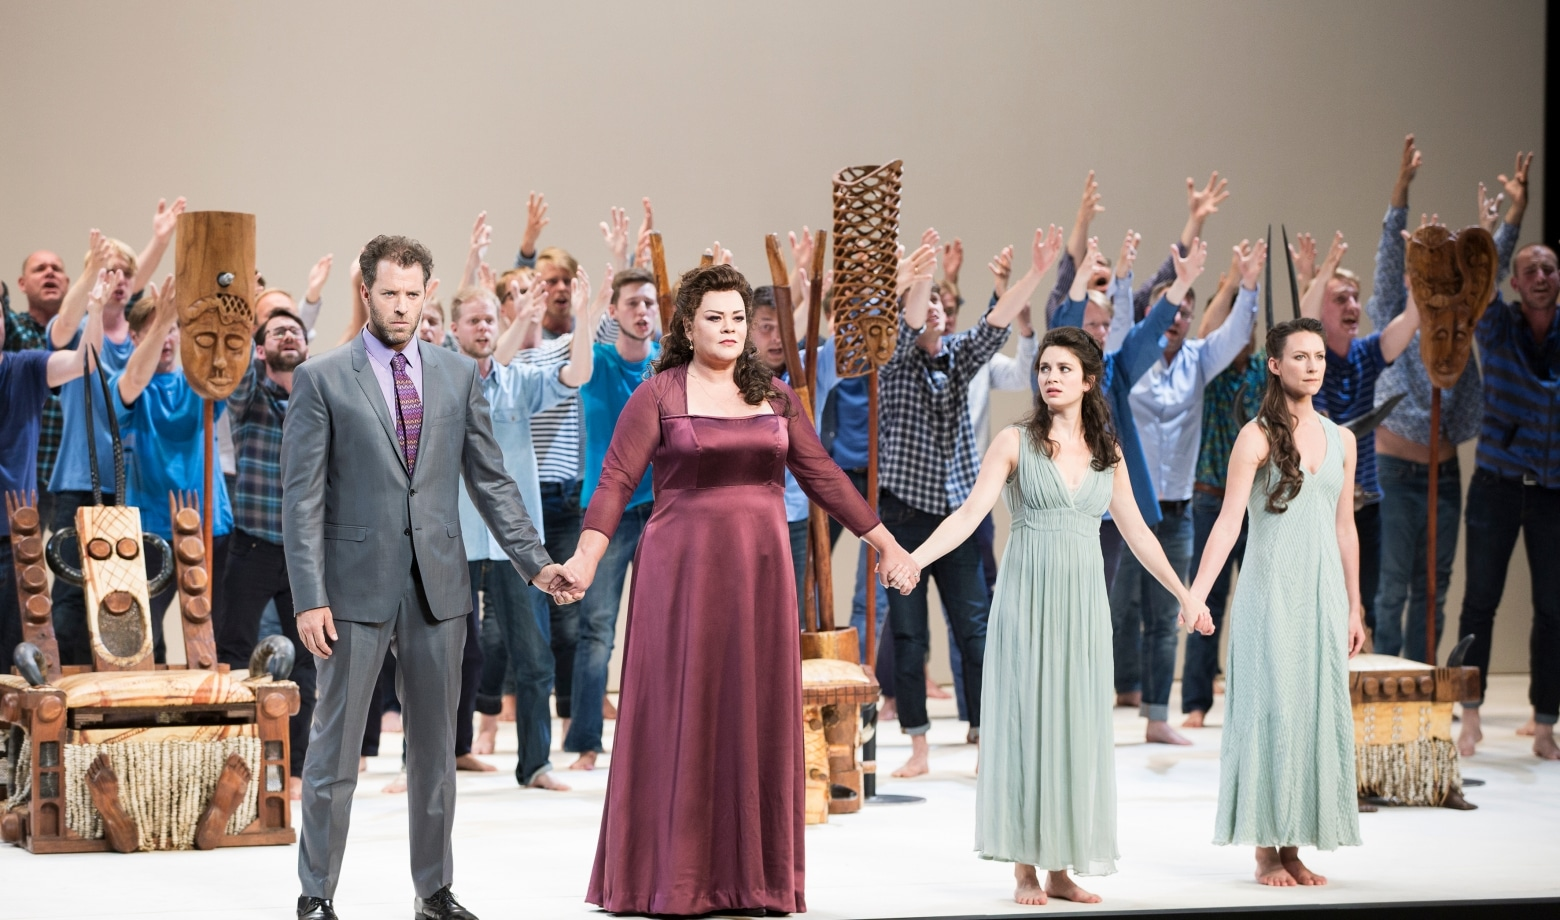 Scène uit Oedipus Rex/Psalmensymfonie bij het Festival d'Aix-en-Provence. (© Vincent Beaume)